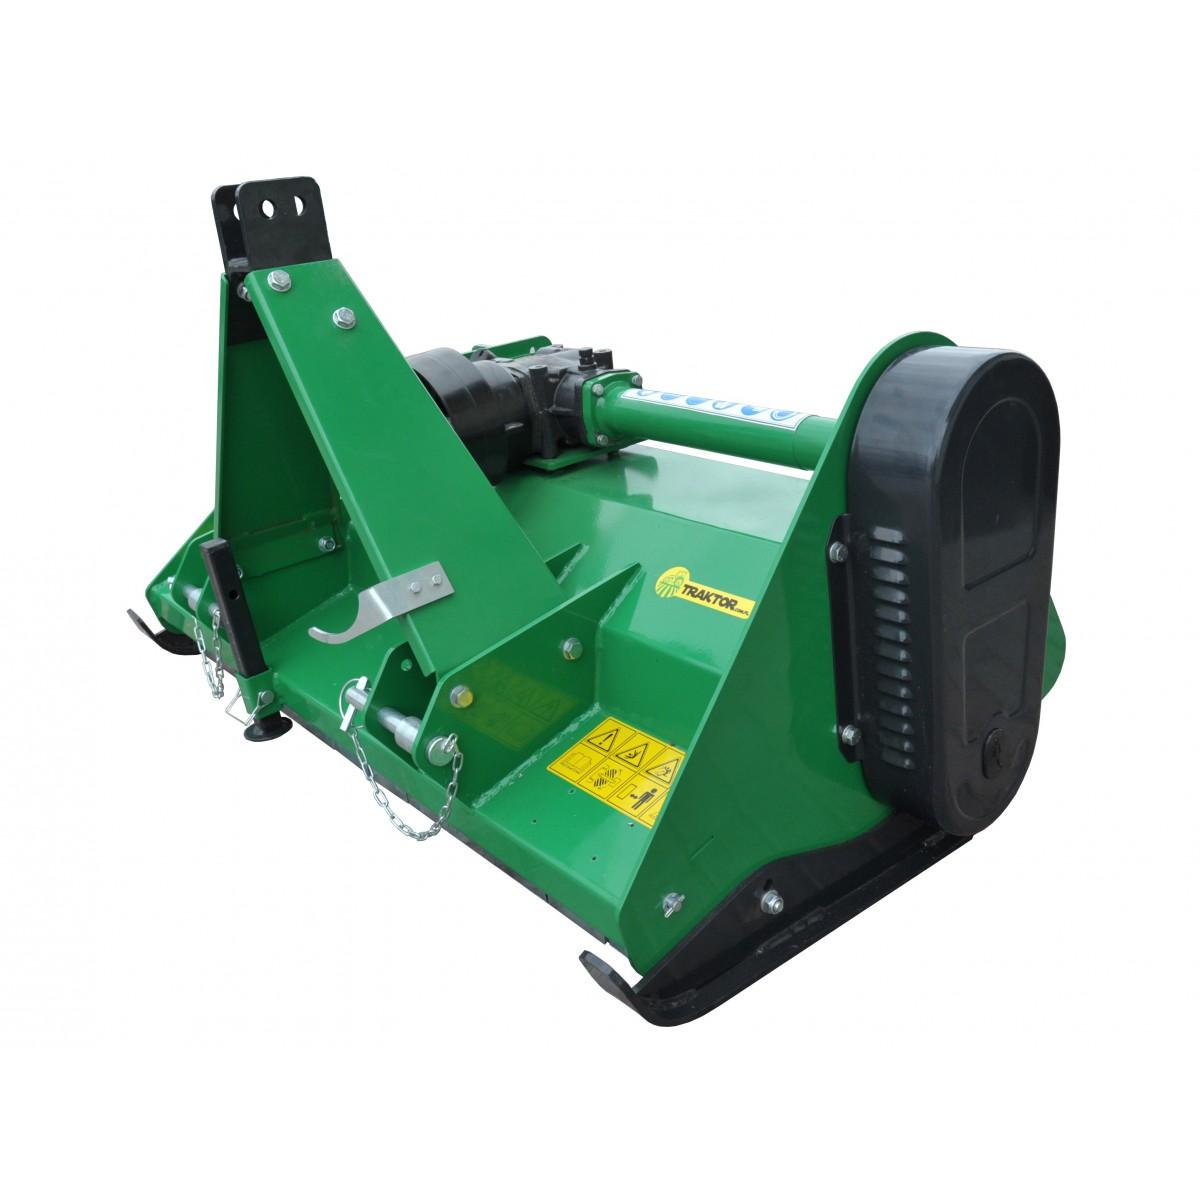 Flail Mower EFG 105 Hammers